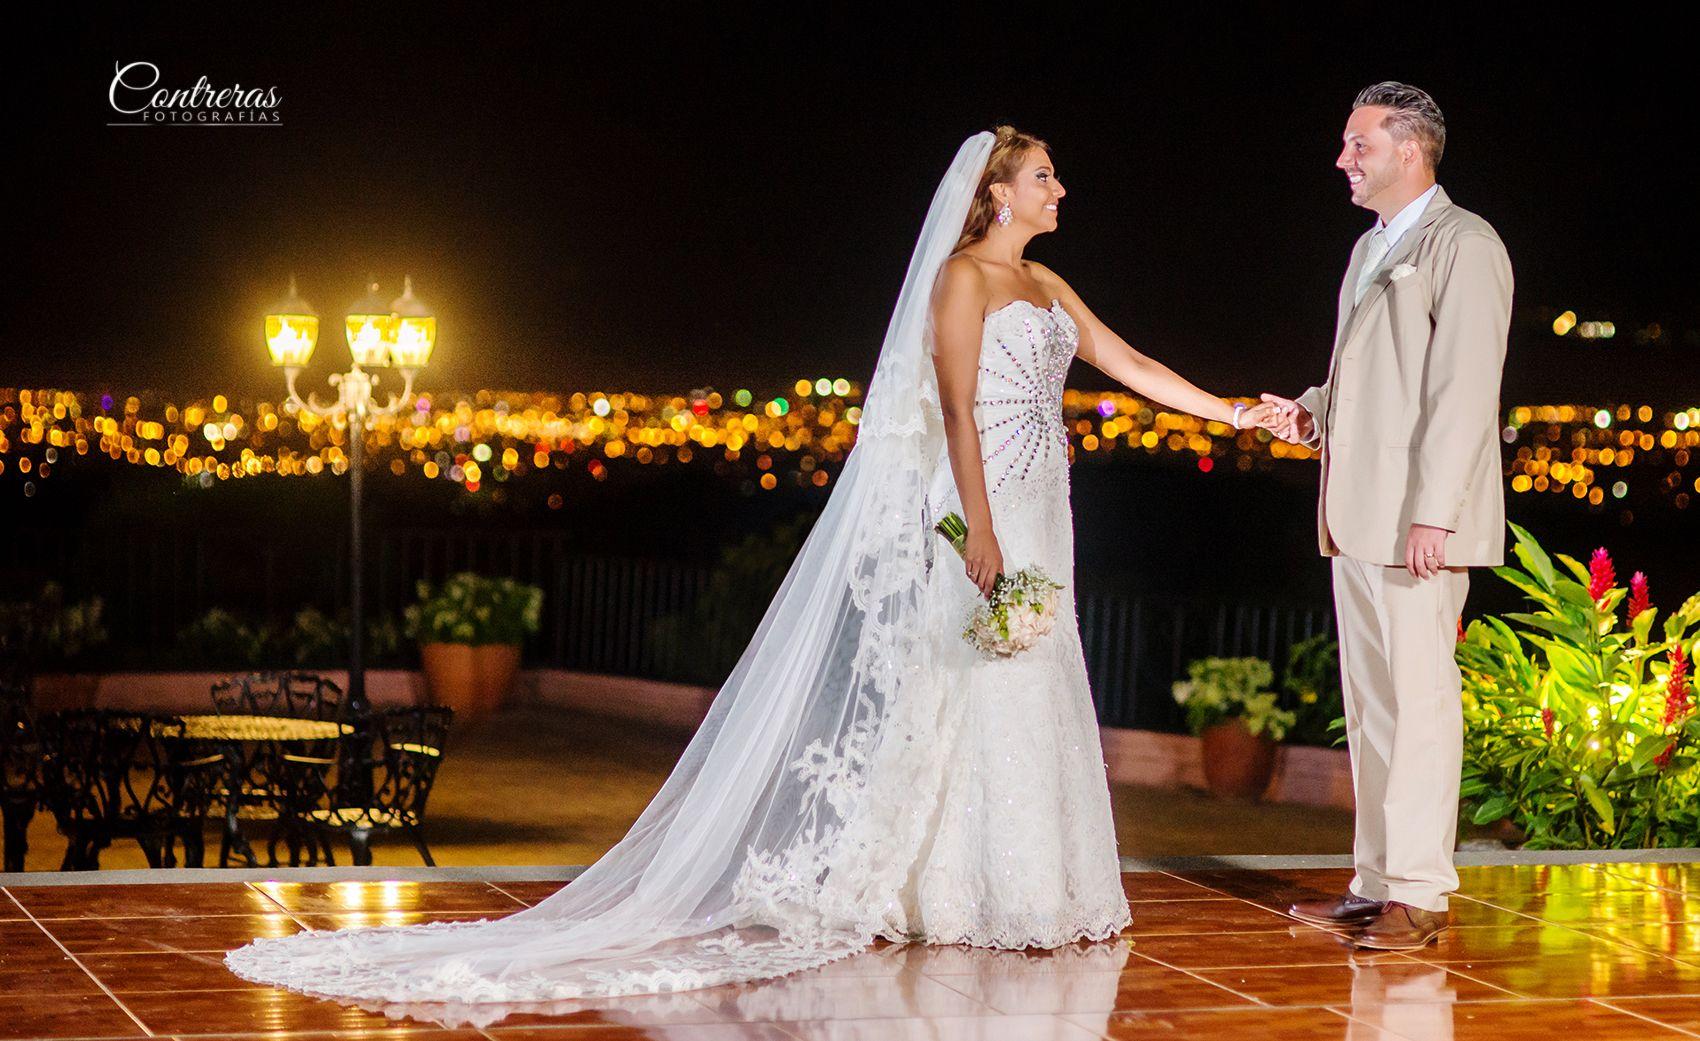 Boda Managua, Intermezzo, Bodas nicaragua Boda Nicaragua Fotografias de bodas, Fotografias de bodas nicaragua #weddignicaragua #contrerasfotografias #bodasnicaragua #wedding  #fotografiasdebodas #fotografiasdebodasnicaragua #novia #weddingphotographynicaragua #Intermezzodelbosque